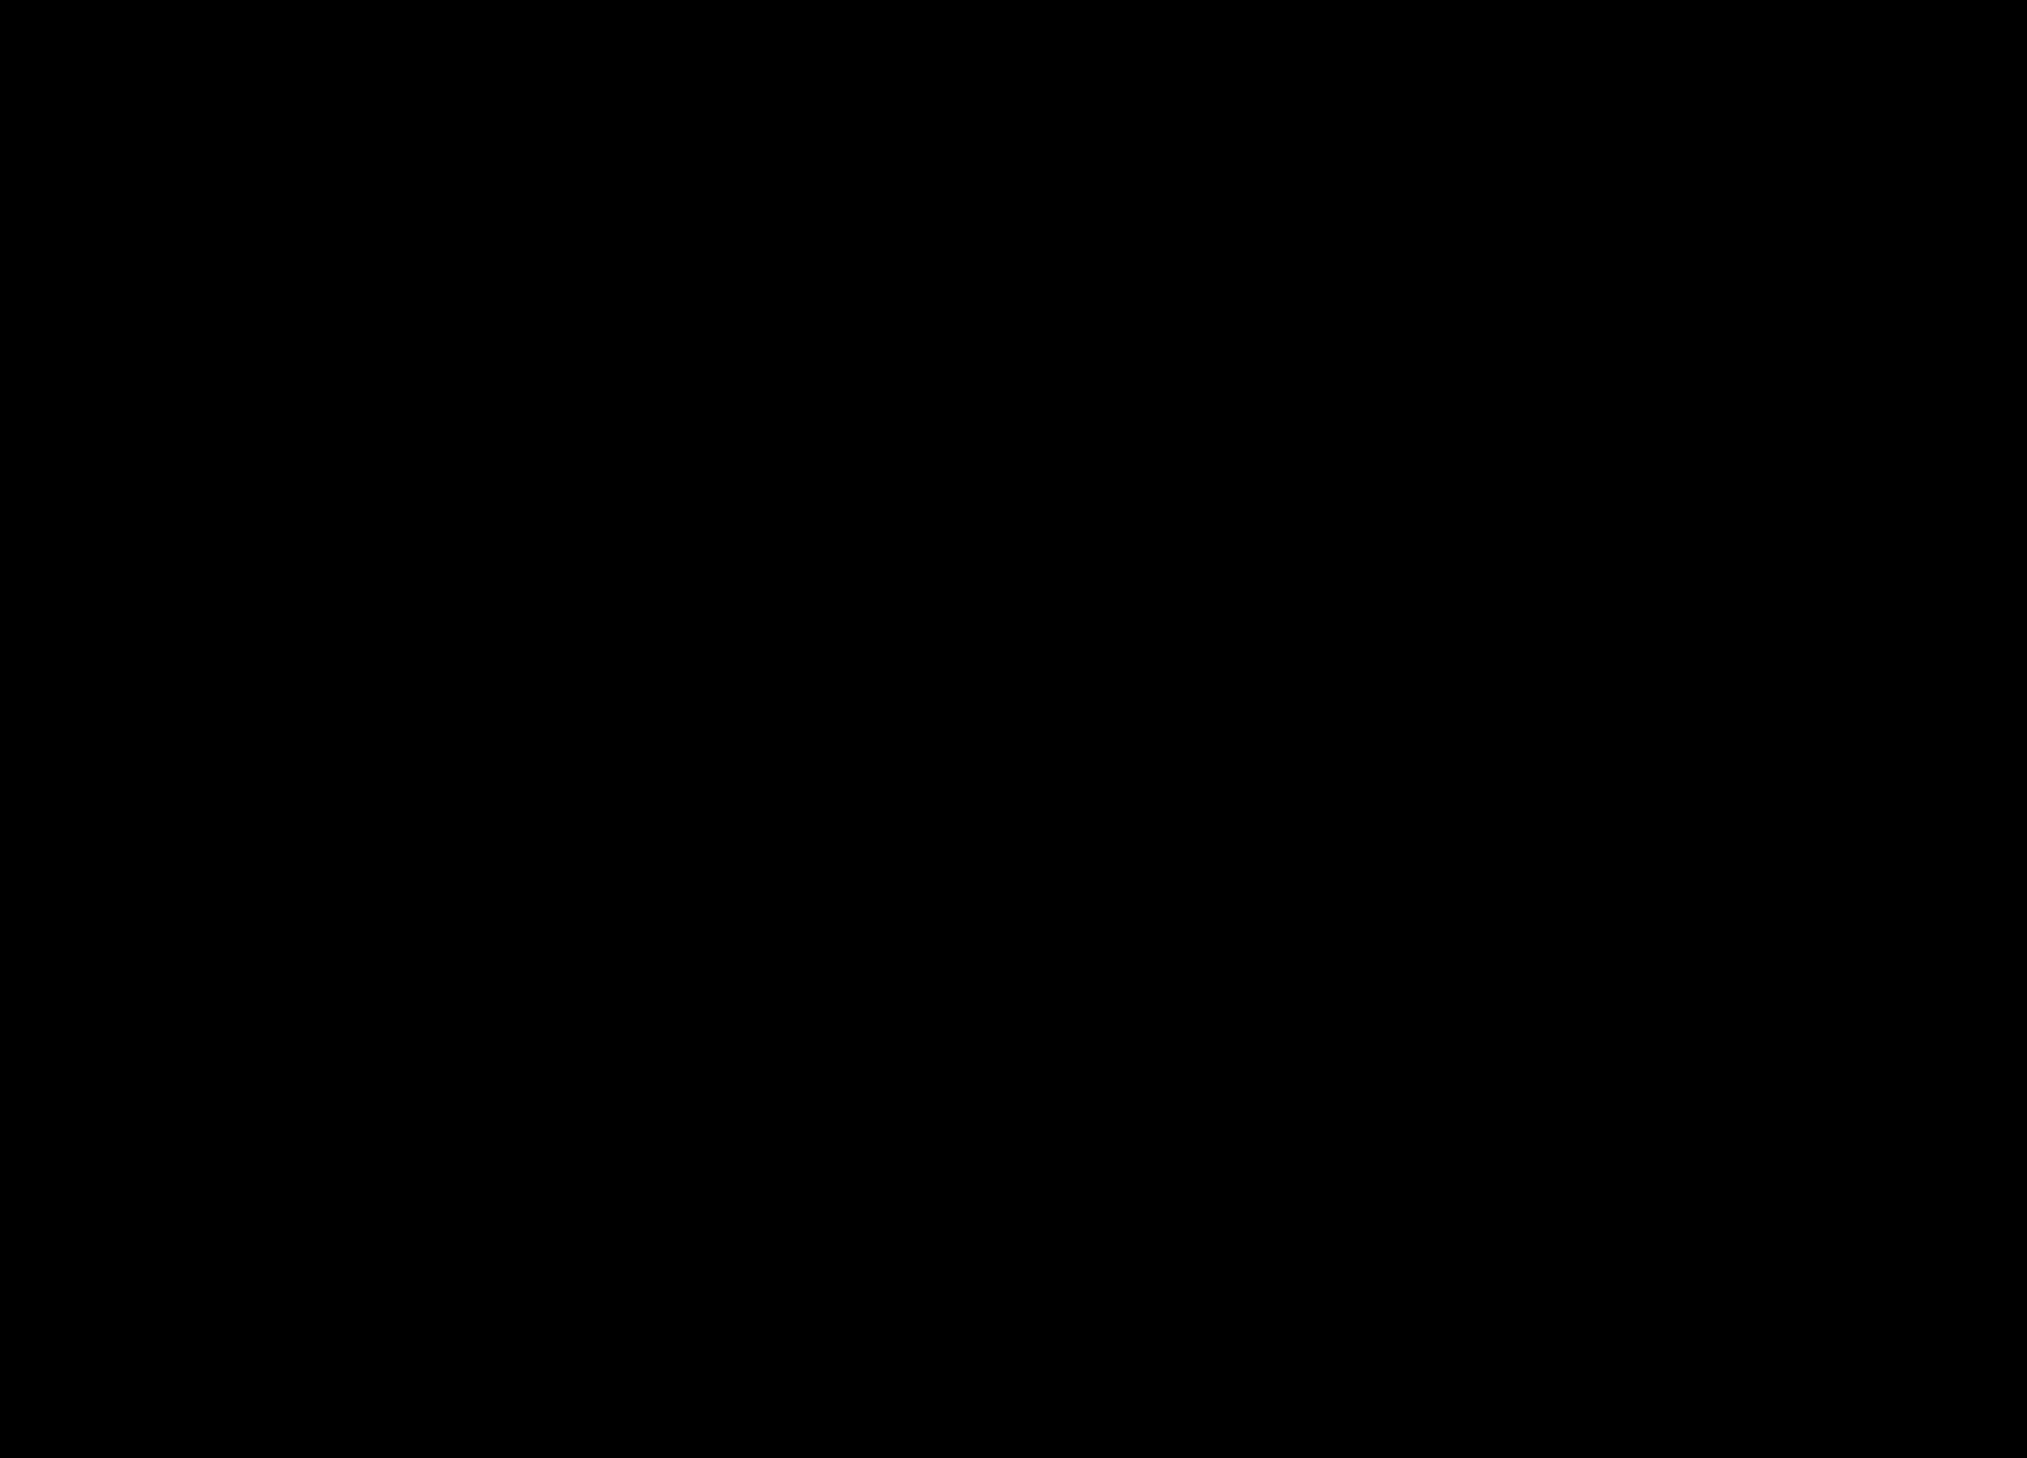 Saturn silhouette at getdrawings. Planet clipart artwork